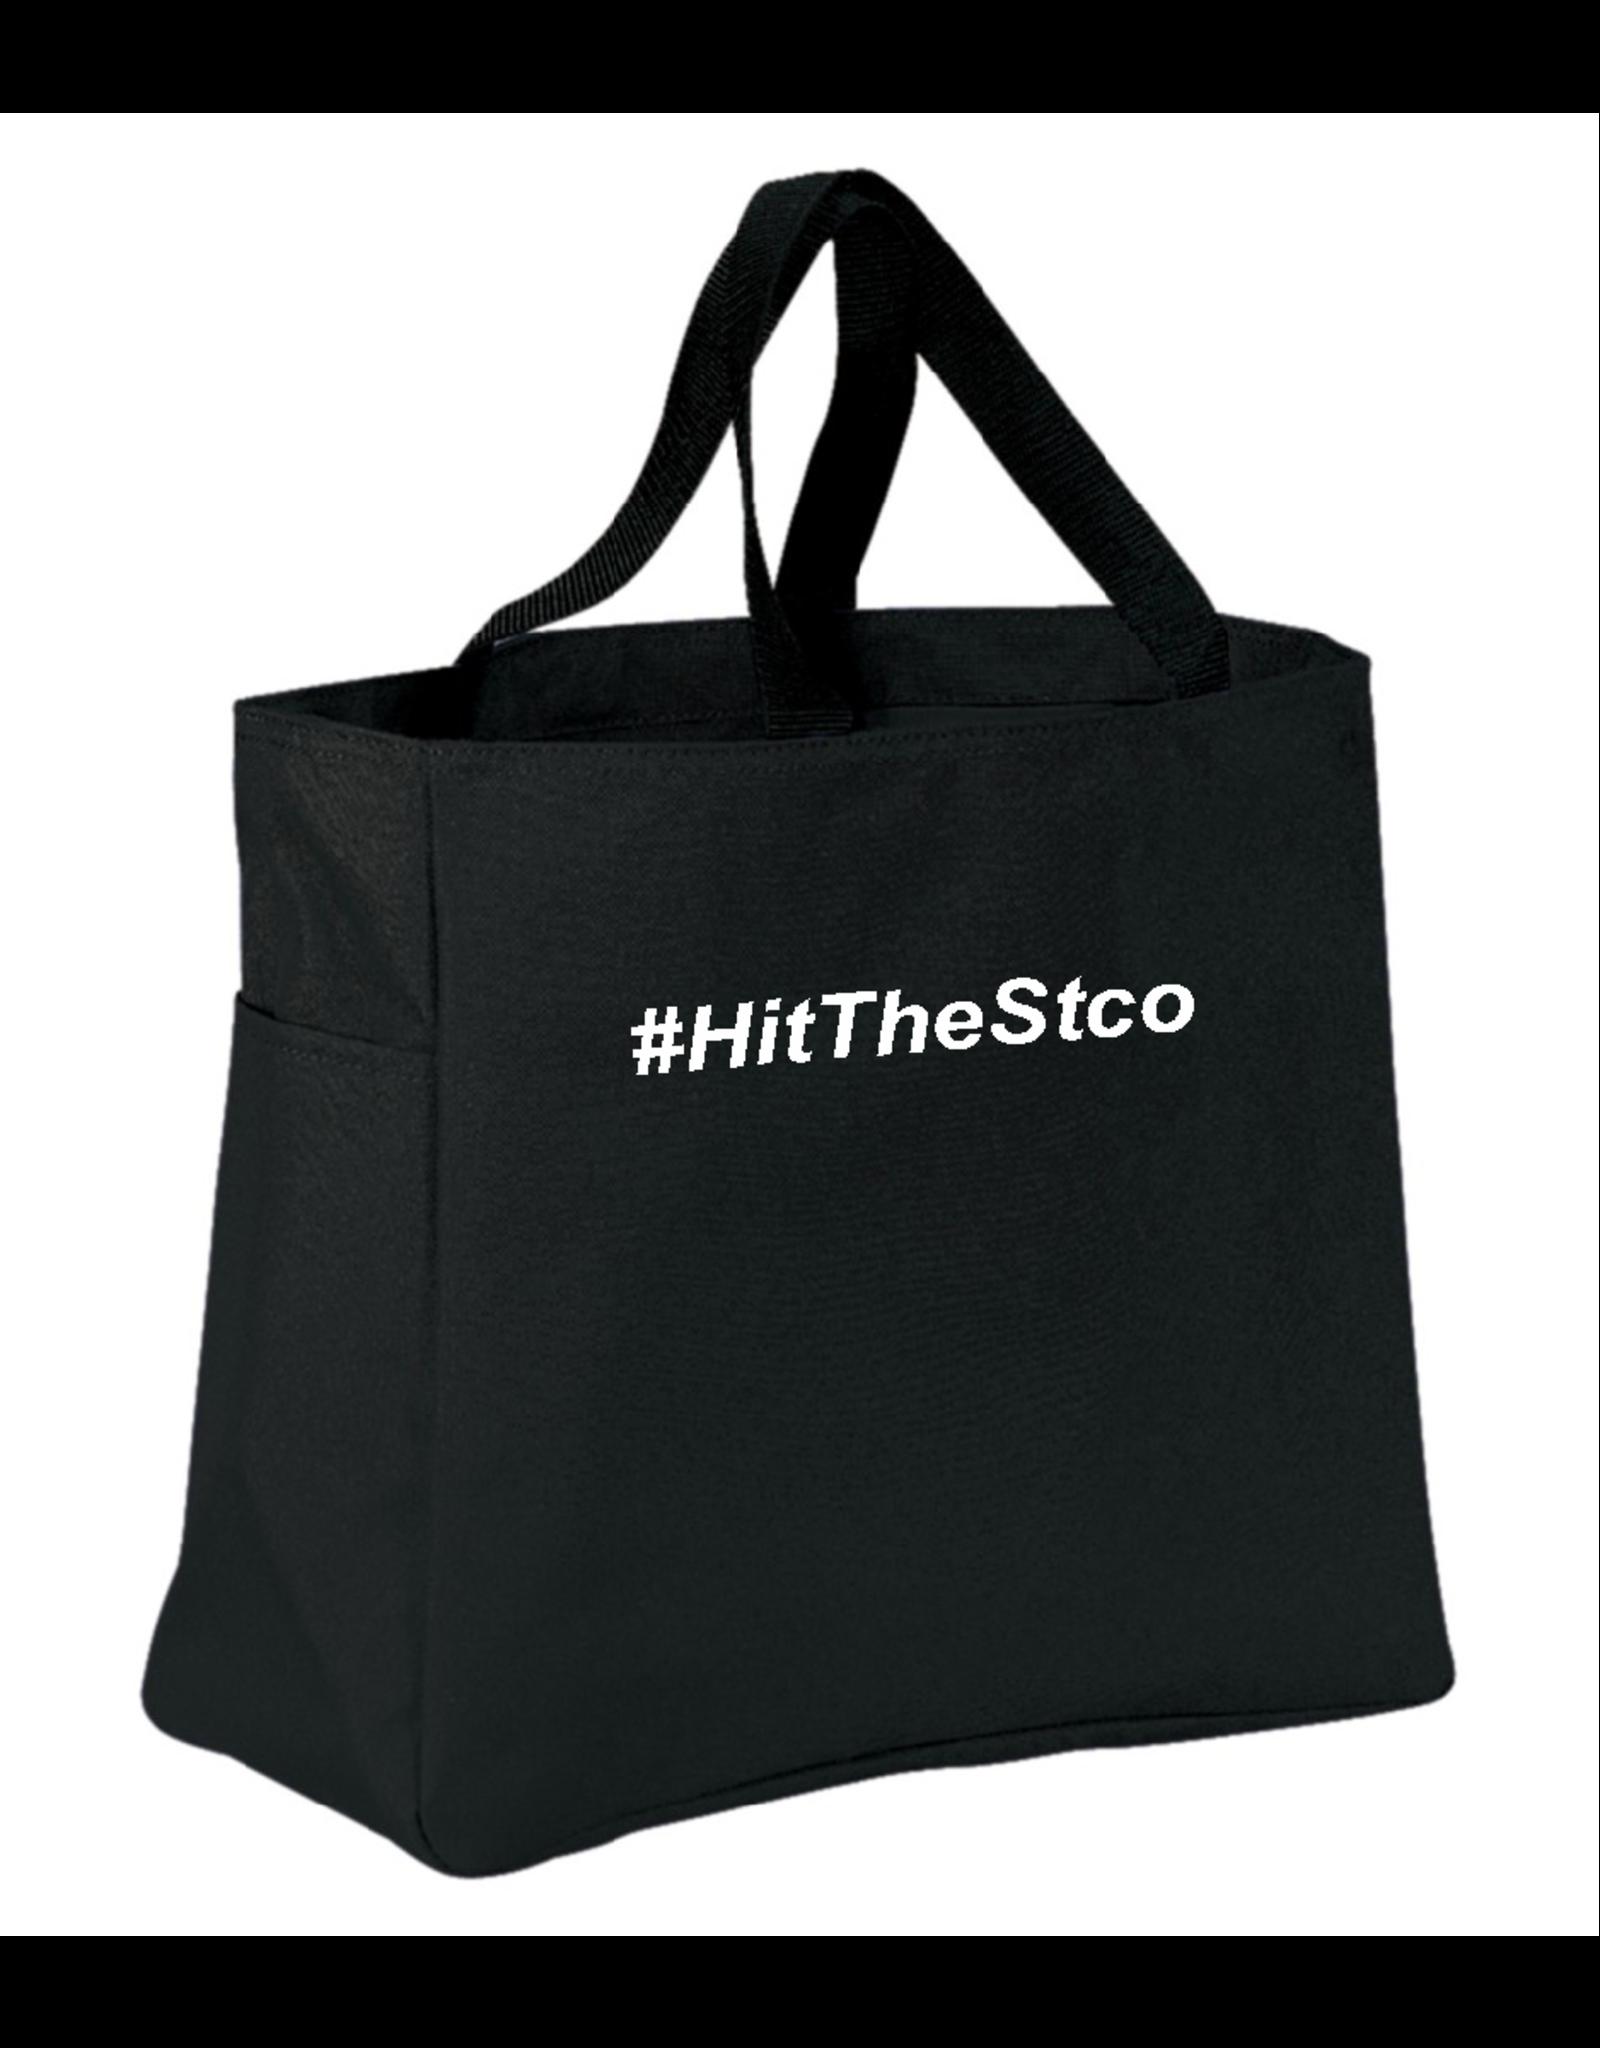 #HitTheStco Hashtag Tote Bag